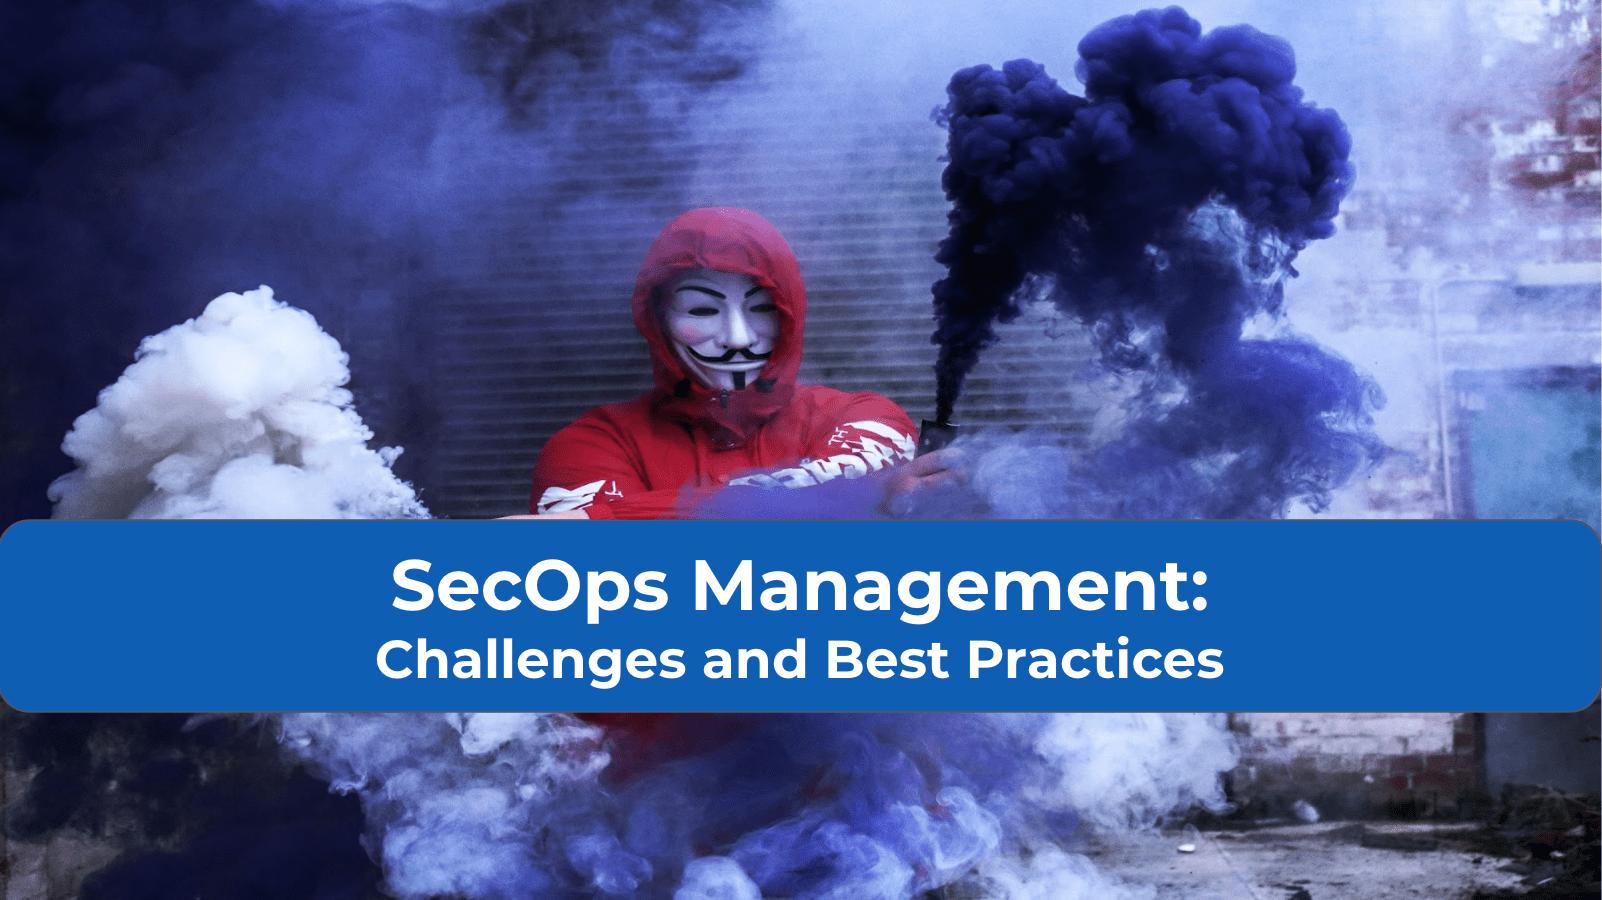 SecOps Management: Challenges and Best Practices